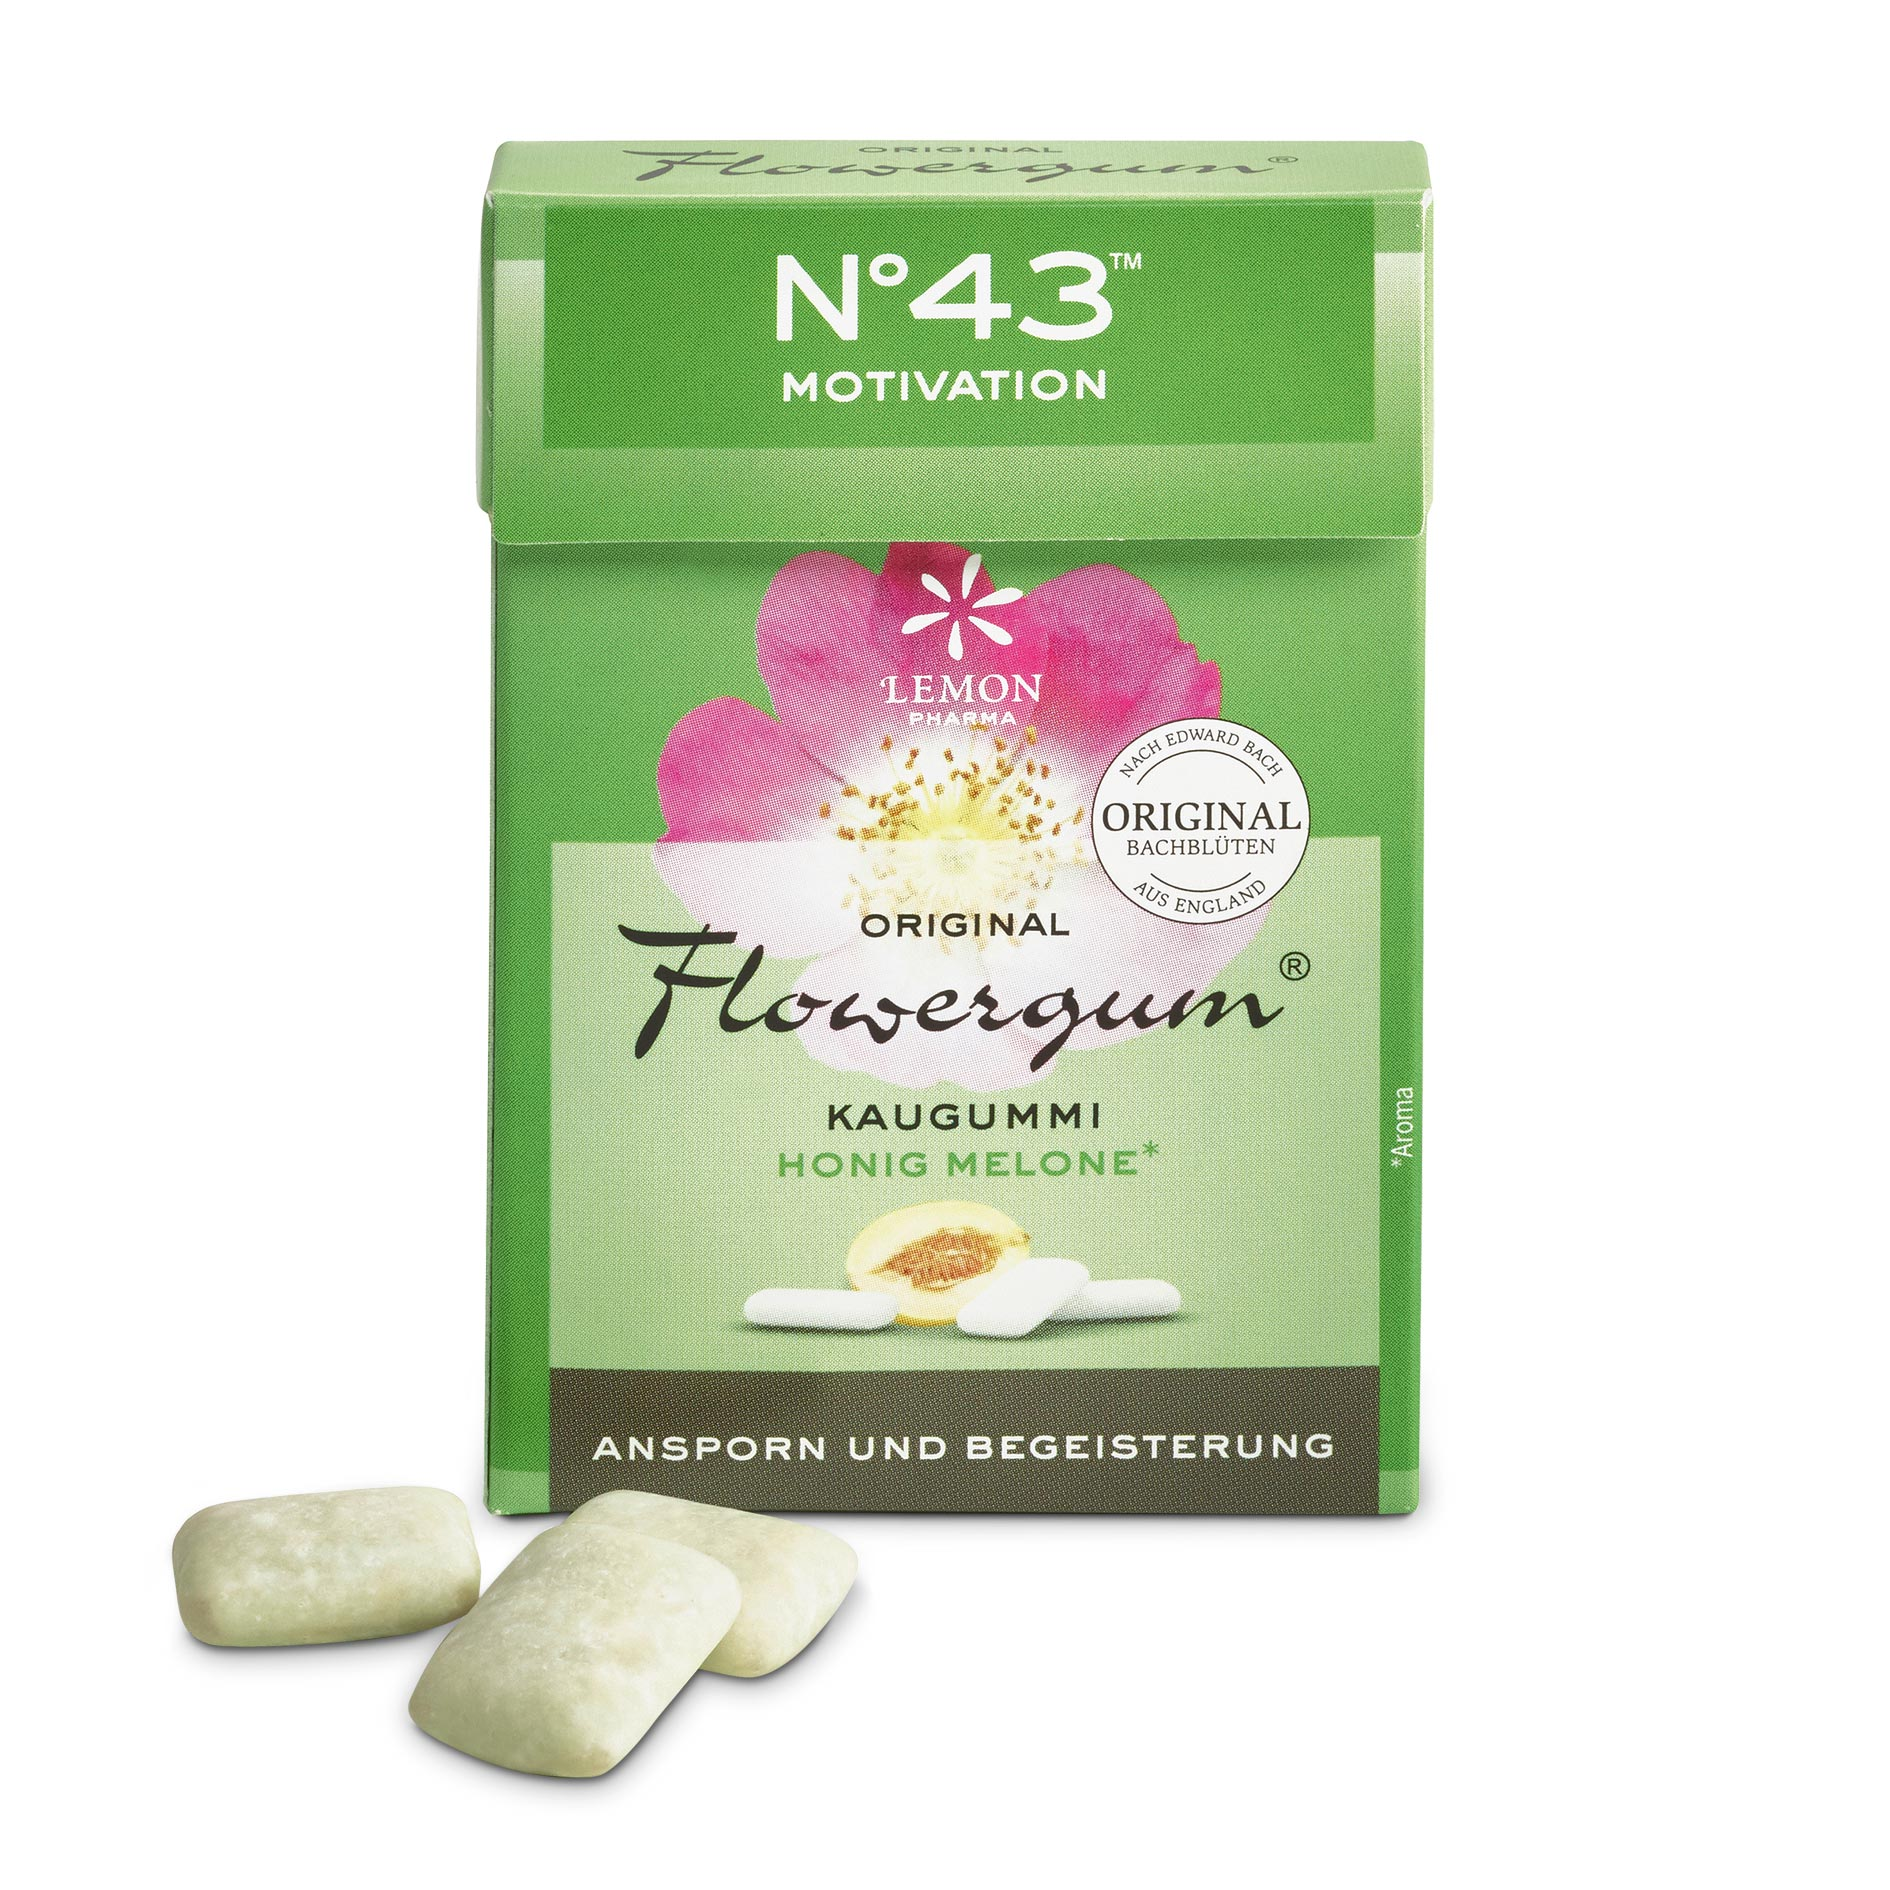 Flowergum 43 Motivazione Fiori di Bach originali Lemon Pharma Bach flowers Slancio ed entusiasmo Murnauers